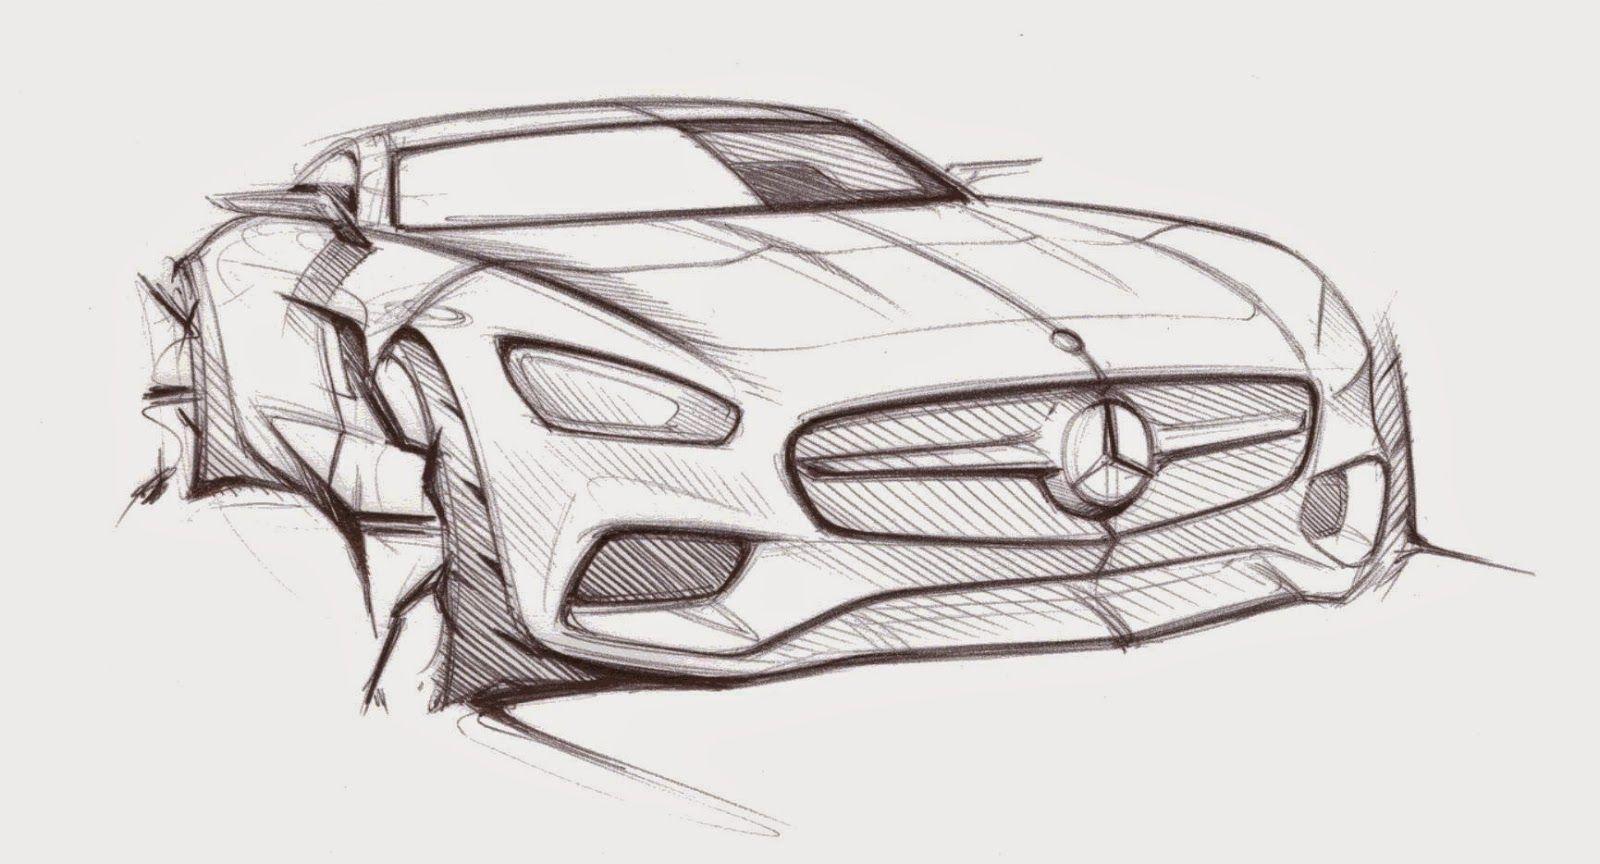 Mercedes Benz Amg Gt Official Sketches At Duckduckgo Car And Motorcycle Design Mercedes Benz Amg Design Sketch